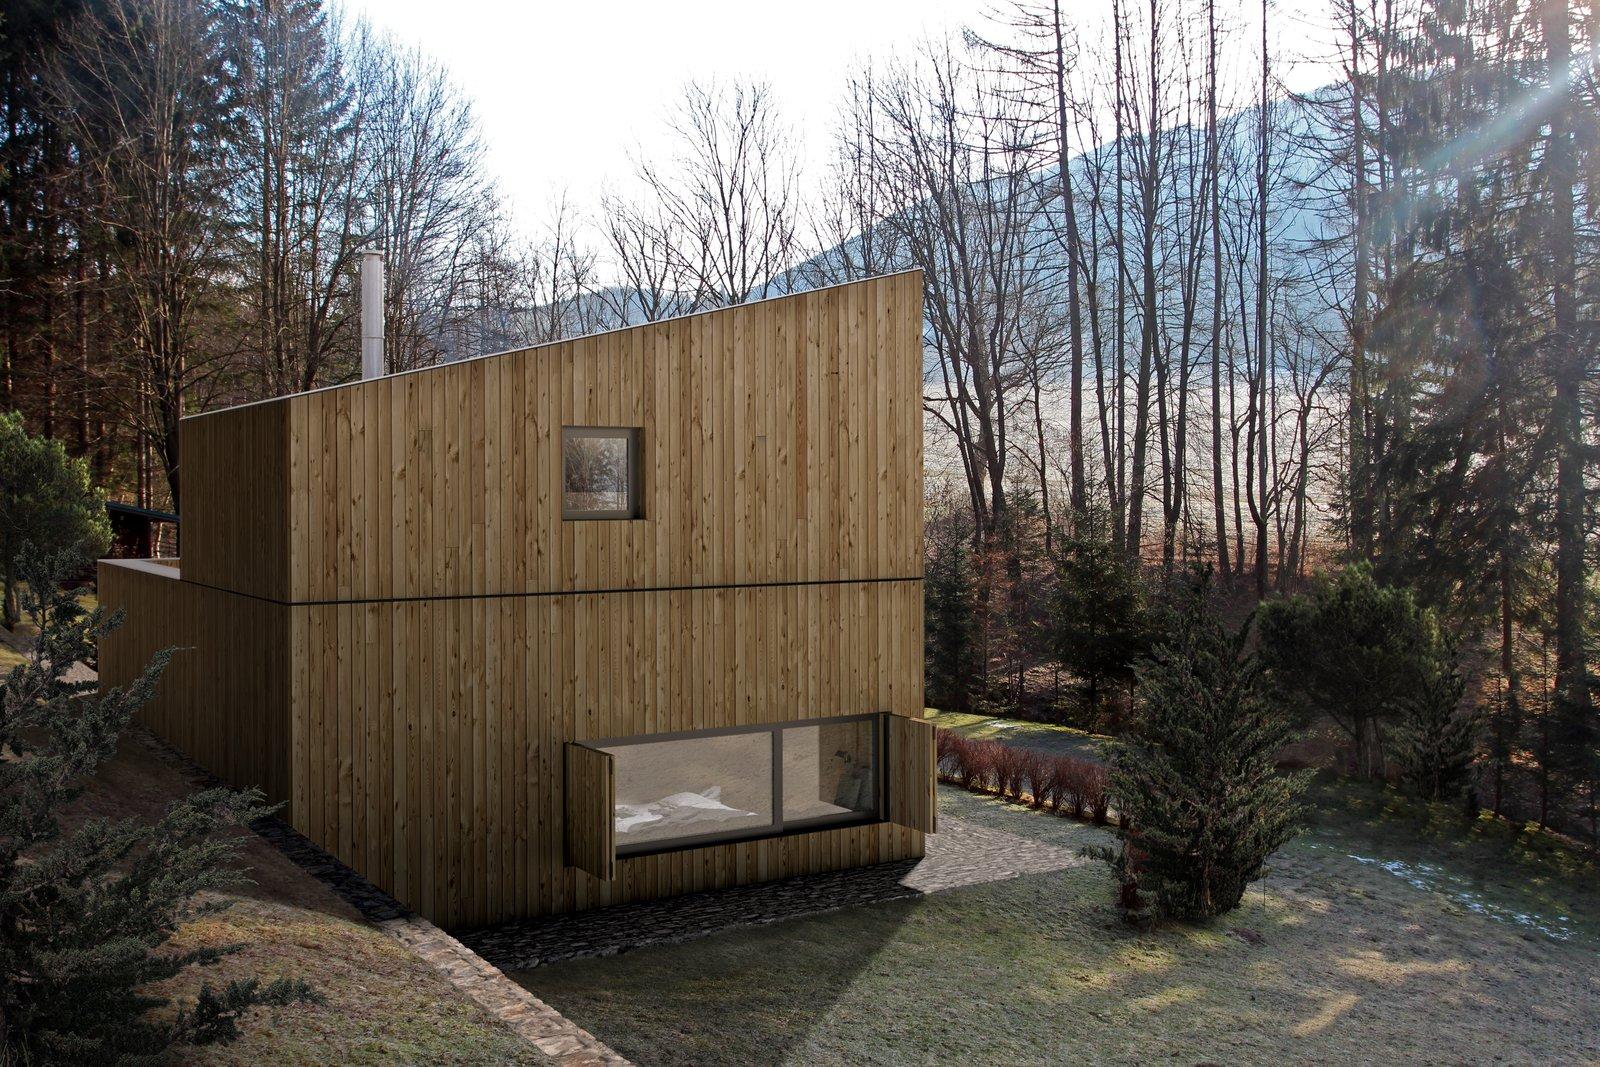 Mountain hut exterior